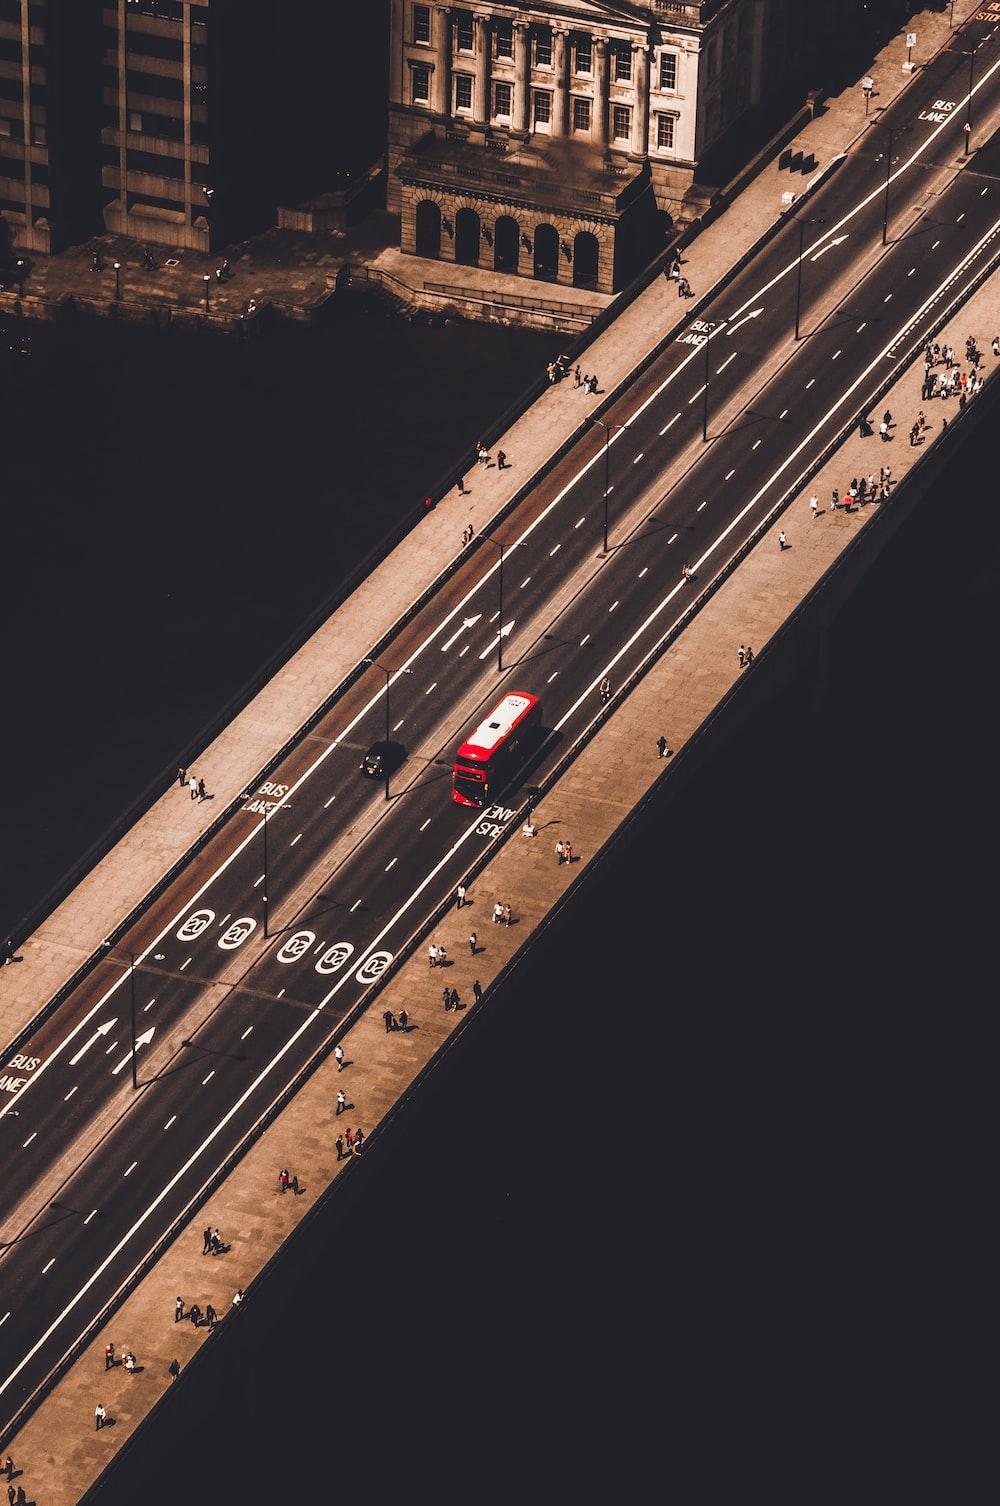 red and white bus running on bridge